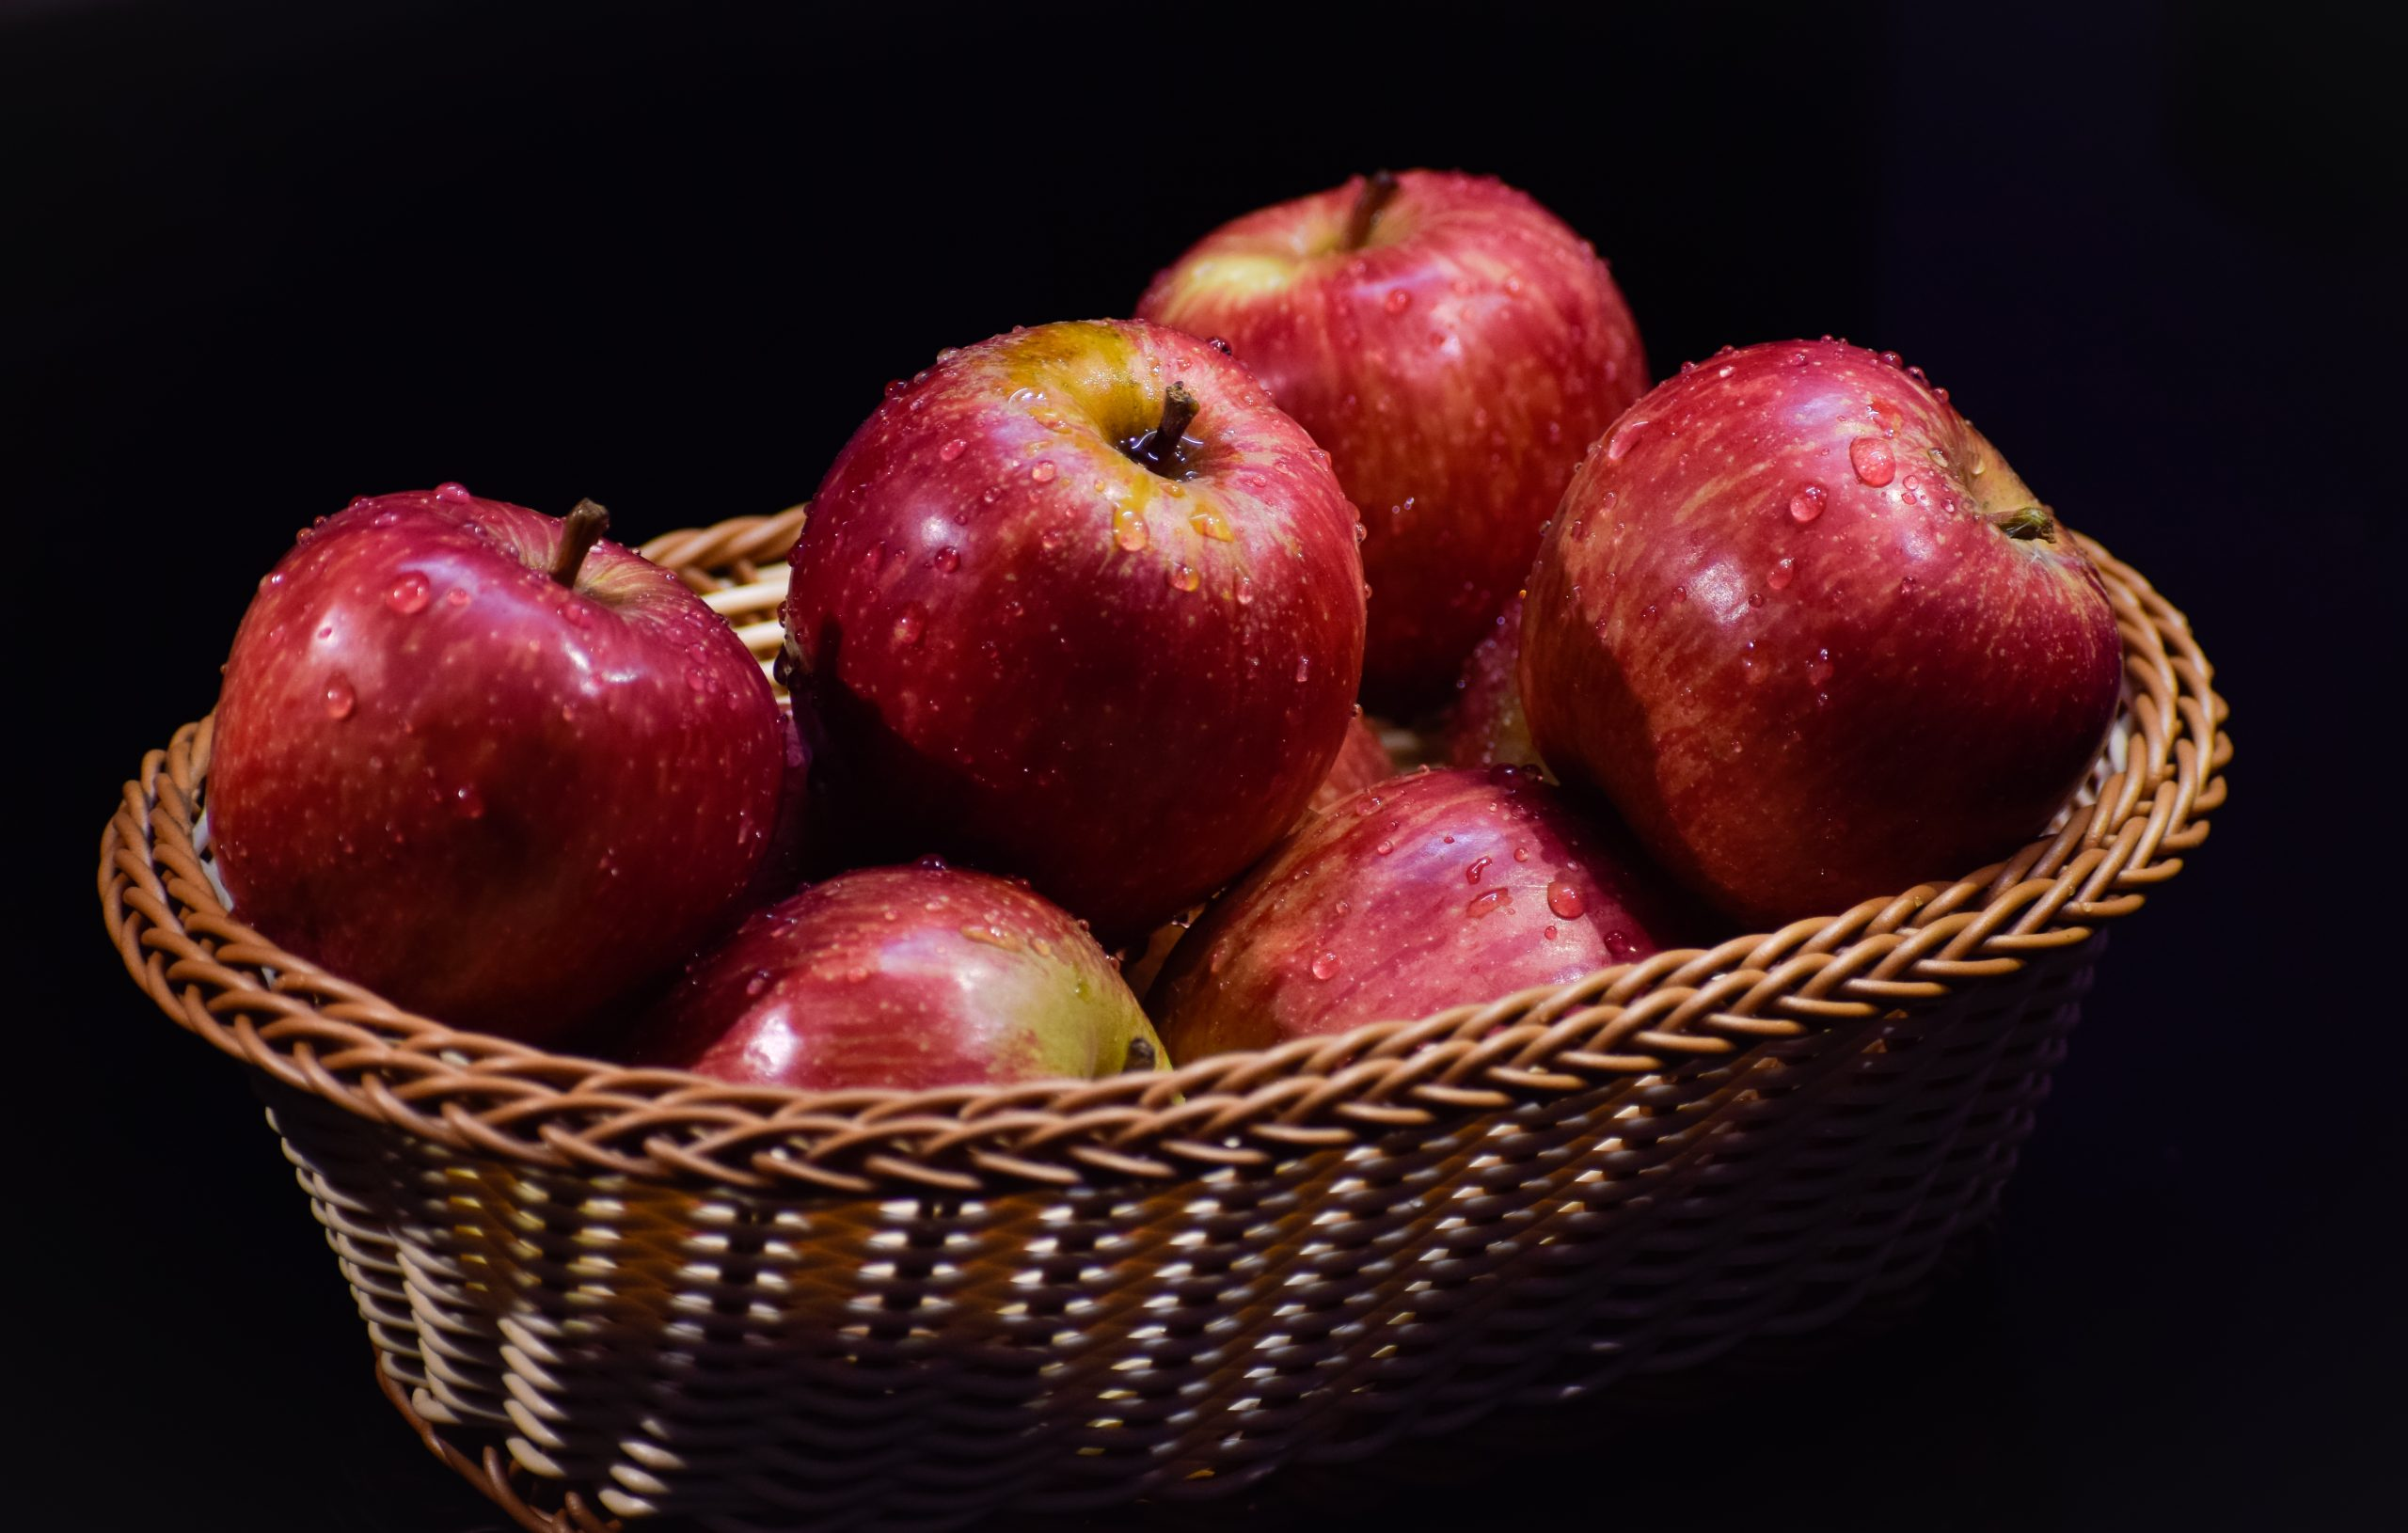 Apple in a Basket on Focus